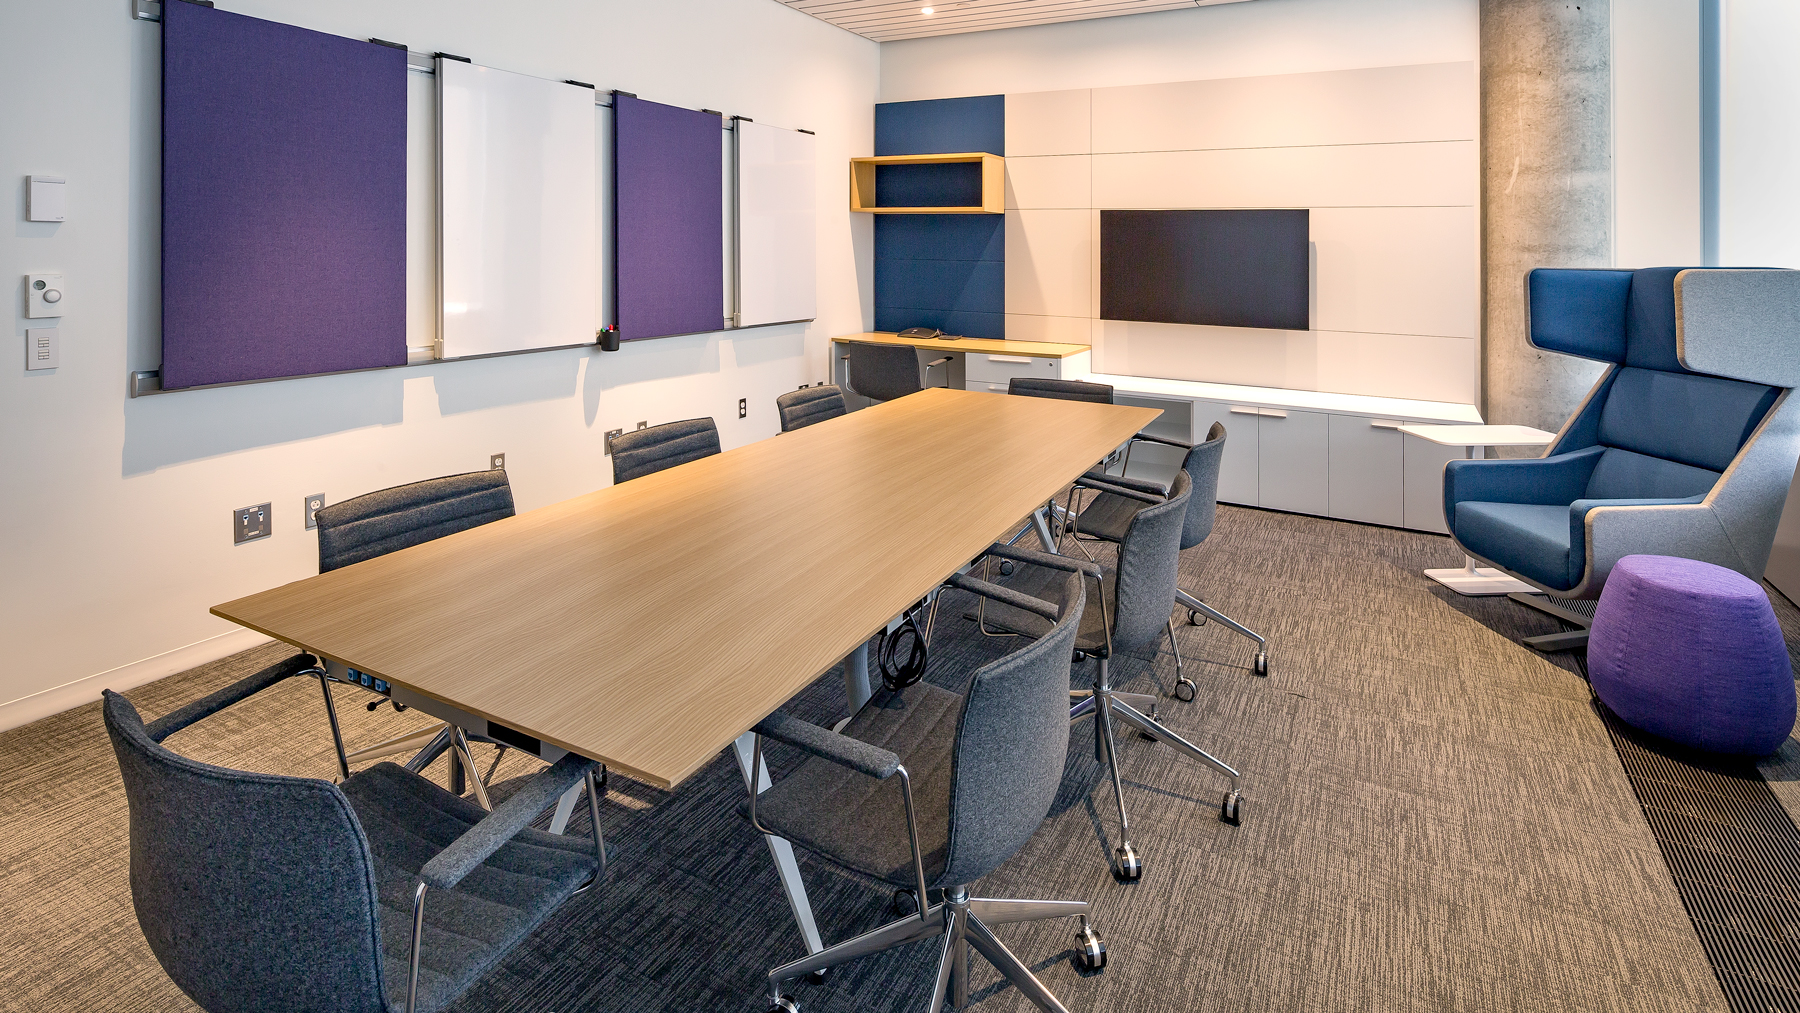 Room 1519 Design Studio